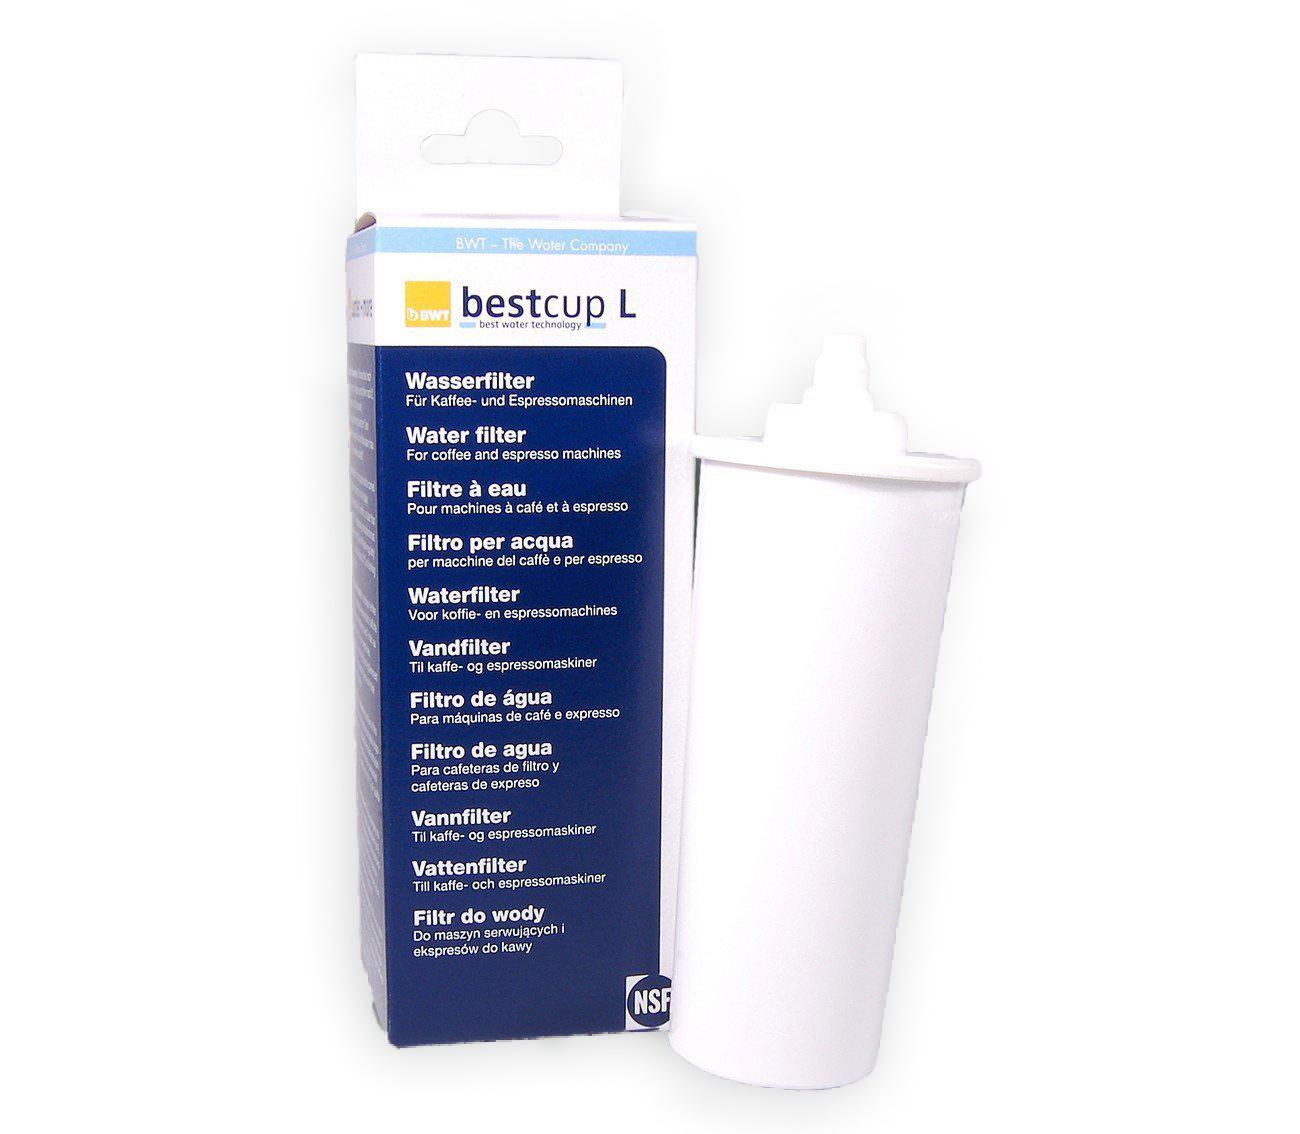 Bestcup-L In-Tank Water Filter